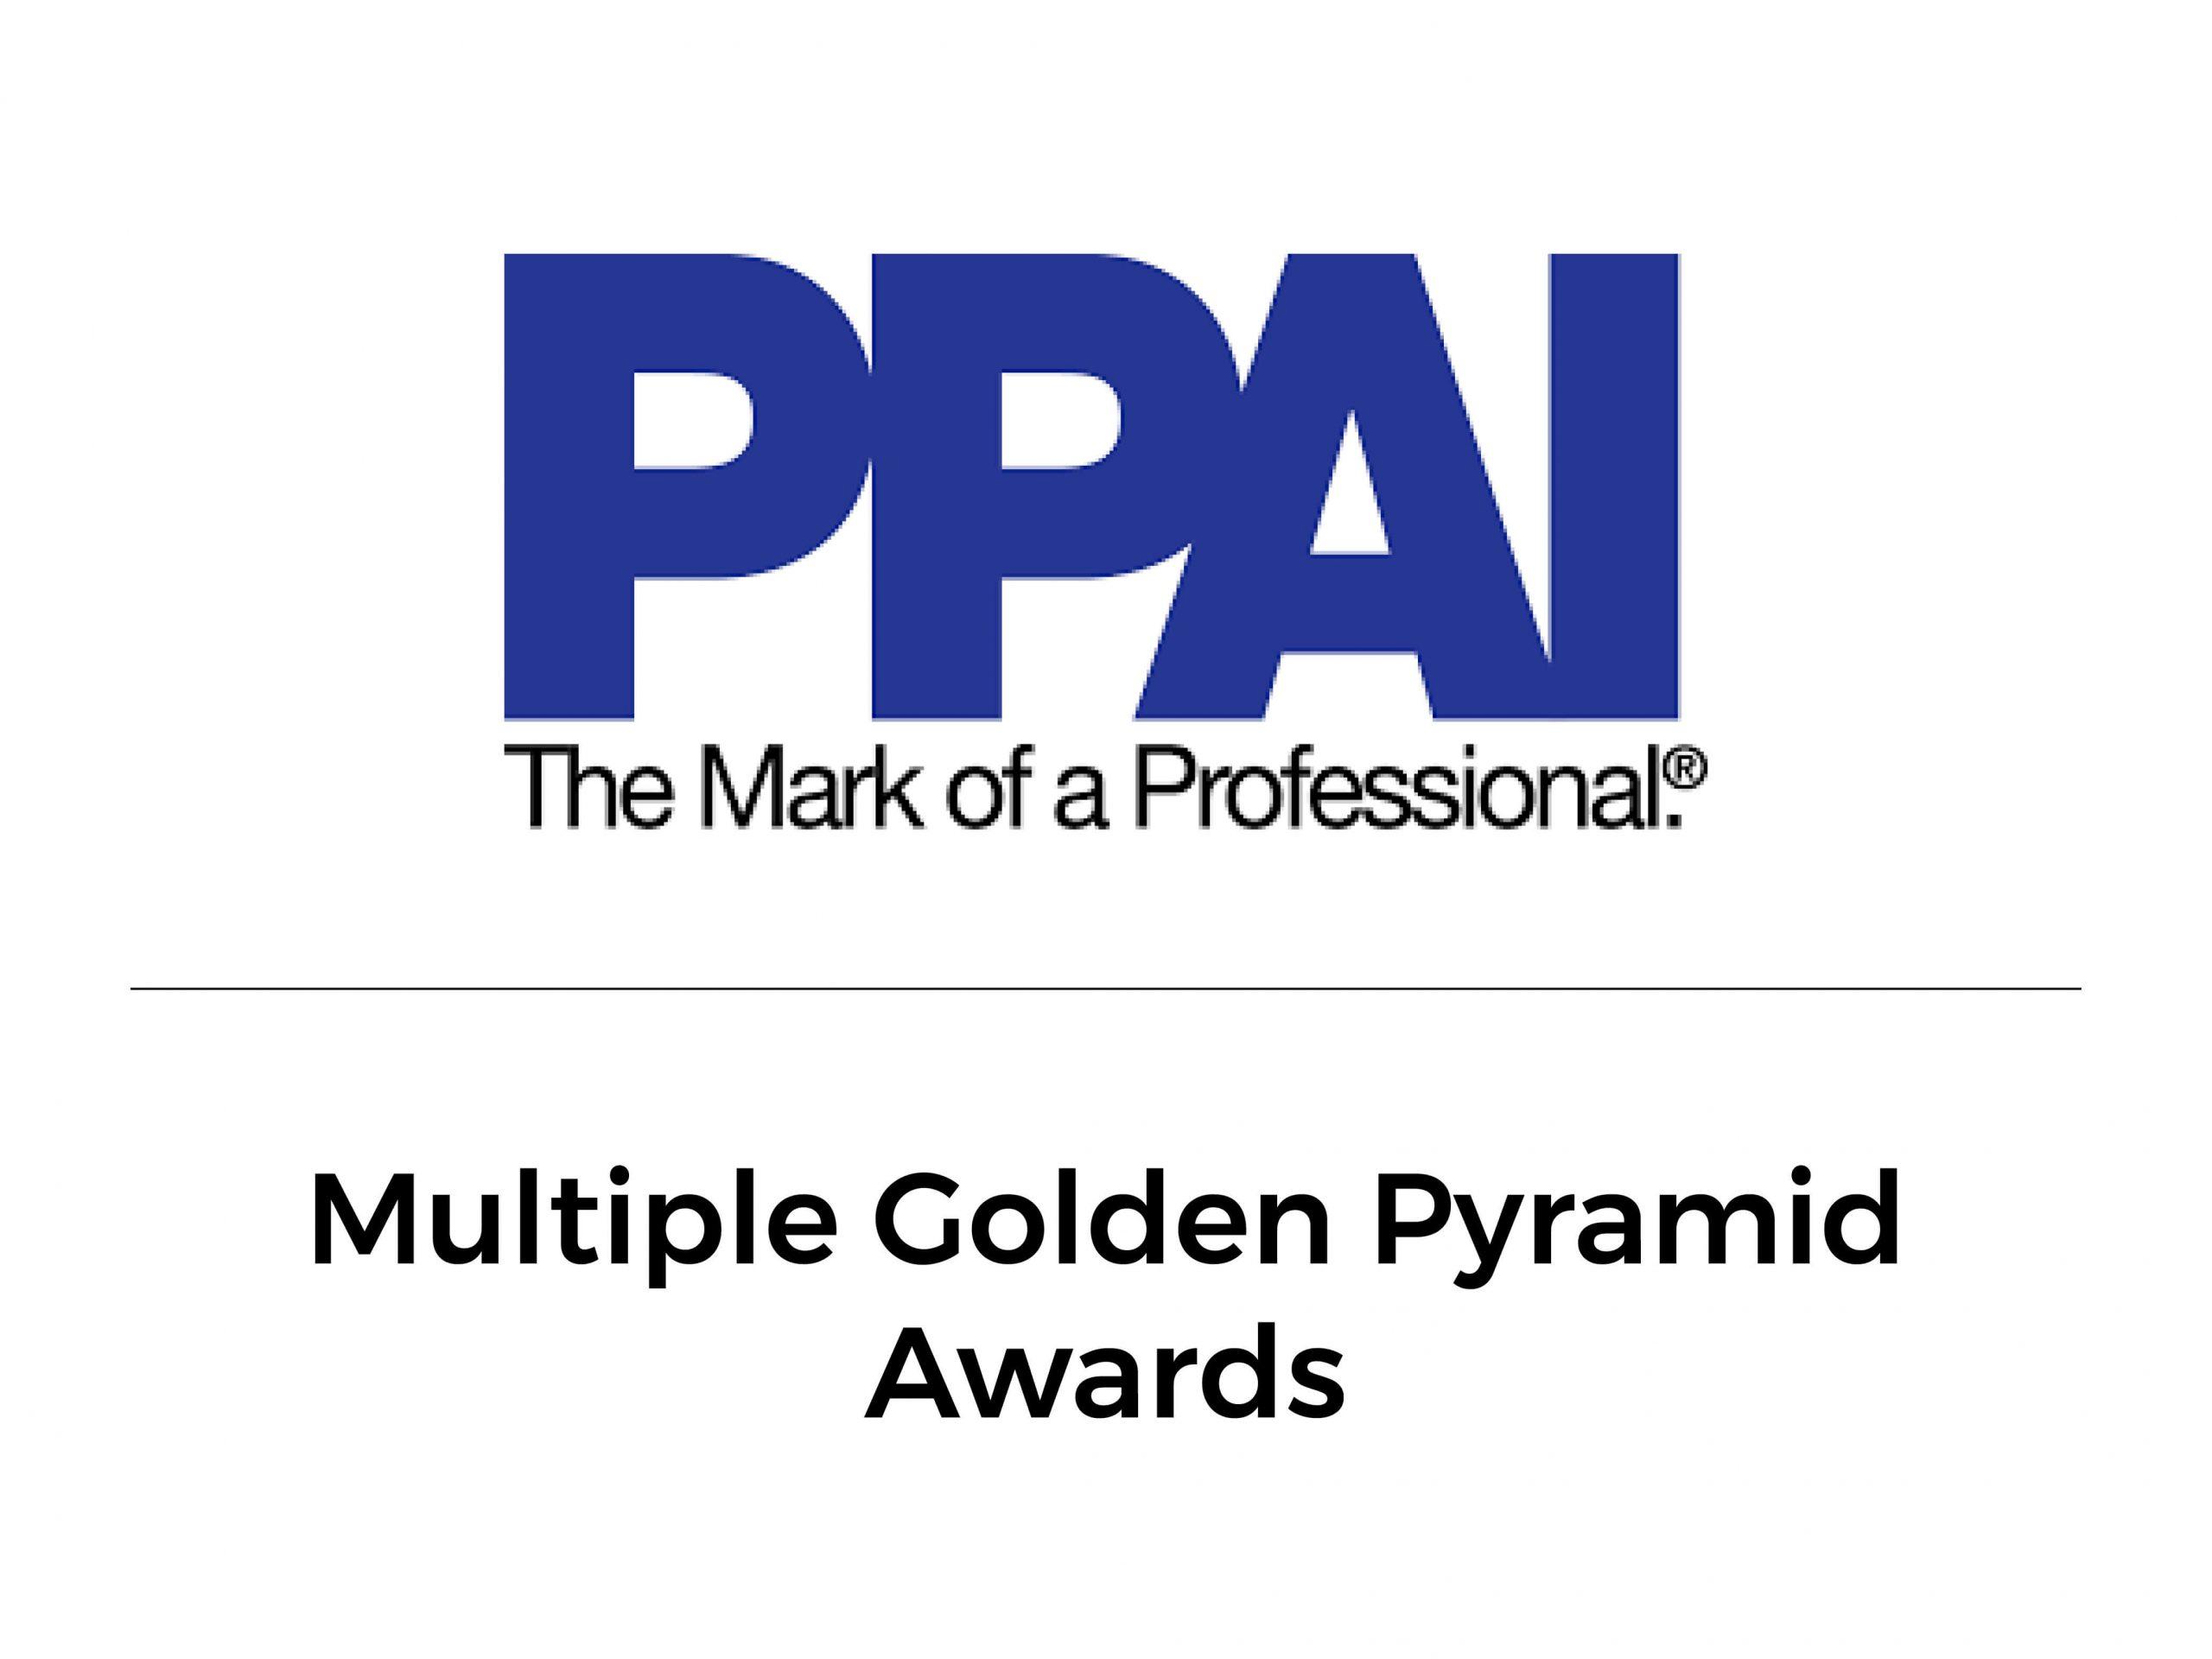 PPAI Multiple Golden Pyramid Awards